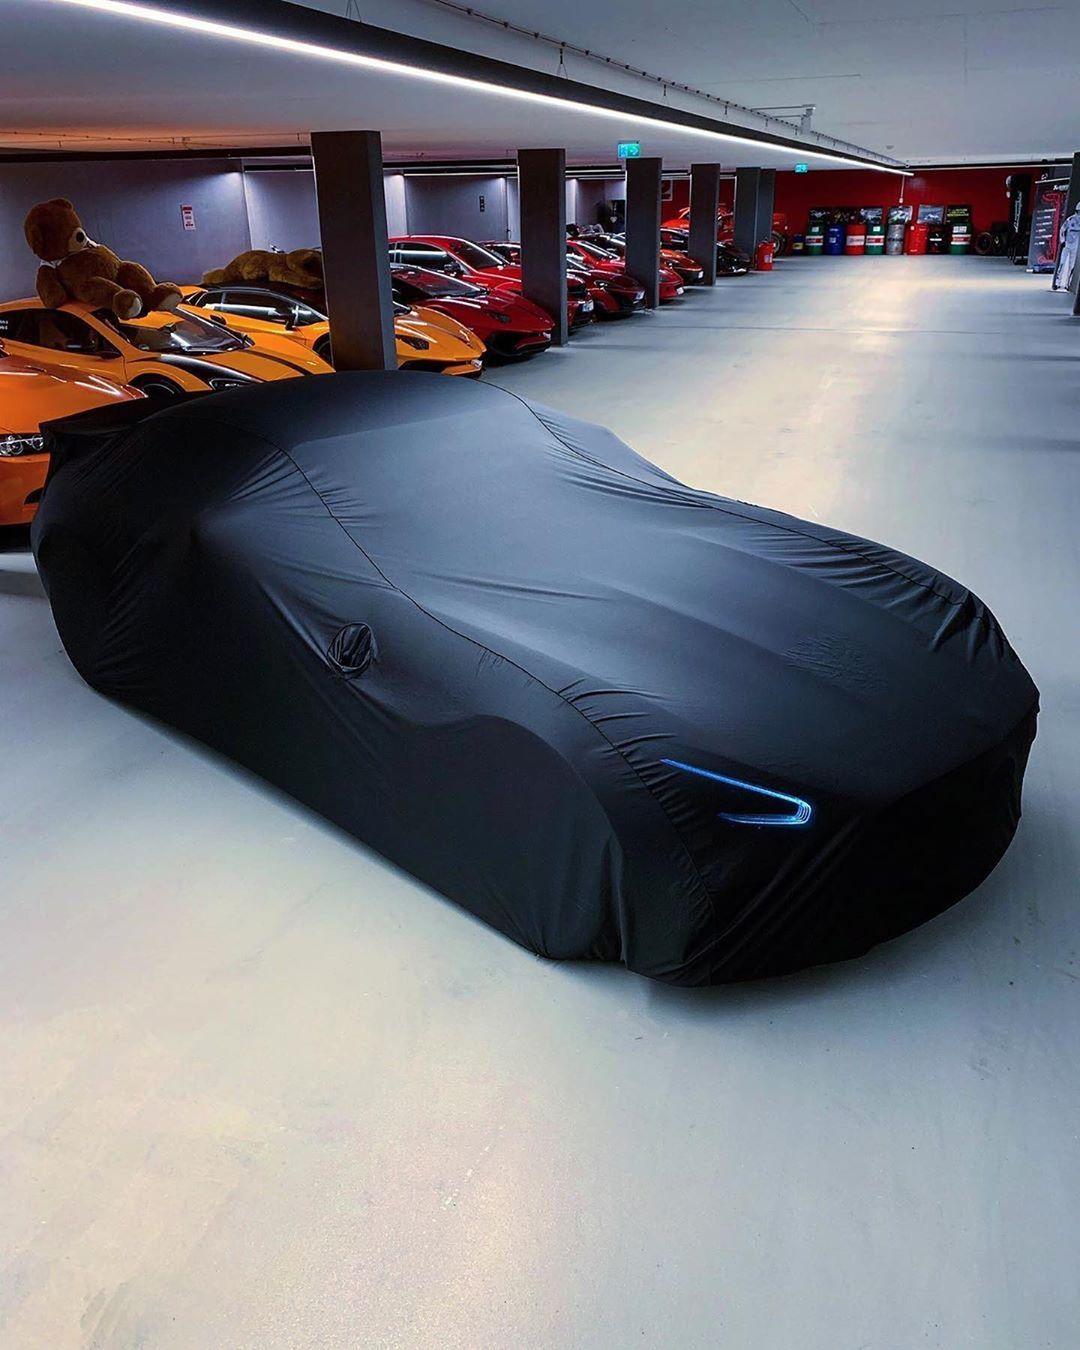 L�ks Otomobil Kamyonlar�  #cars #luxurycars #sportcars #conceptcars #motorcycles #trucks